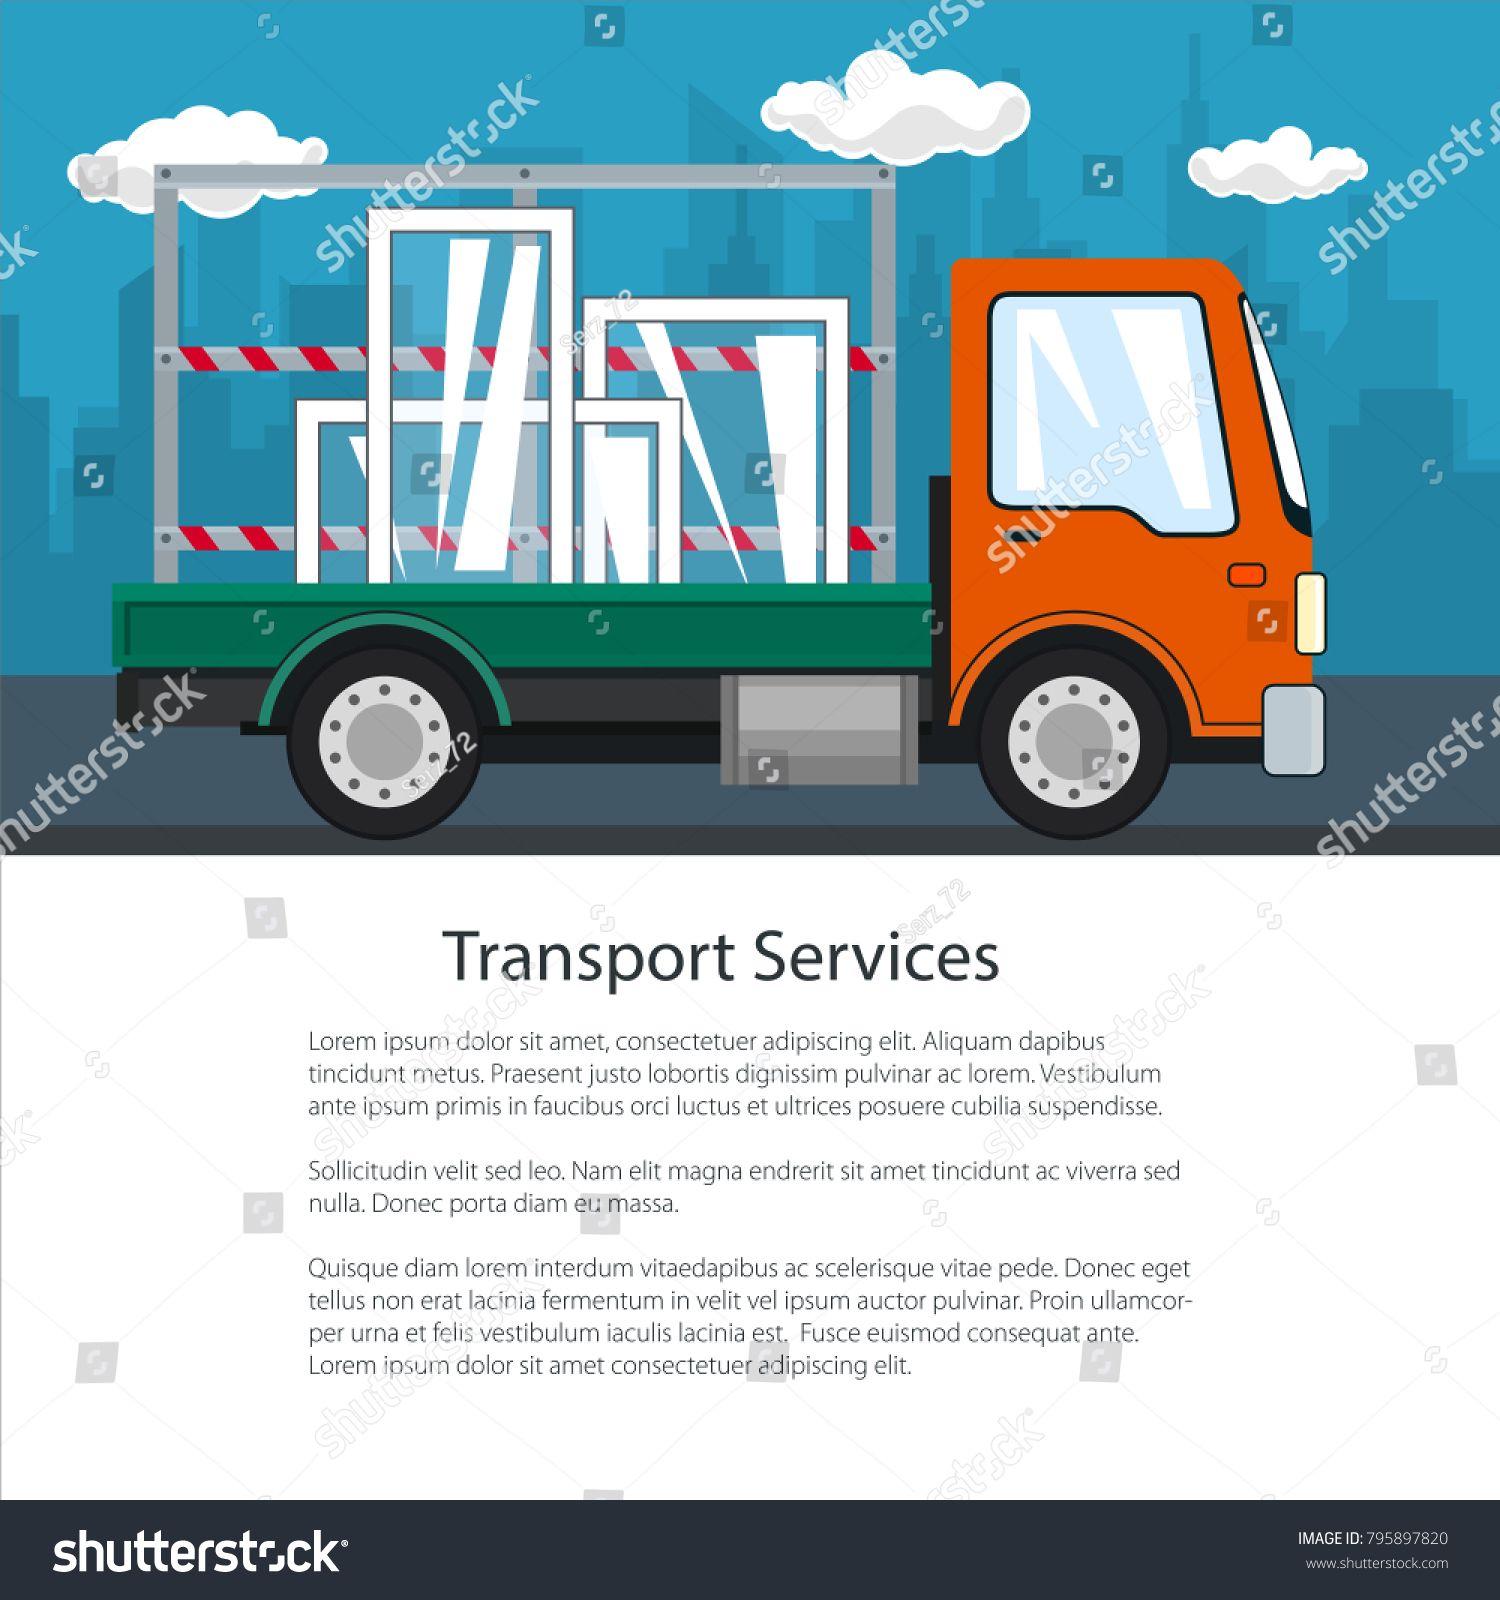 Brochure Of Lorry Small Truck Transports Windows Transportation